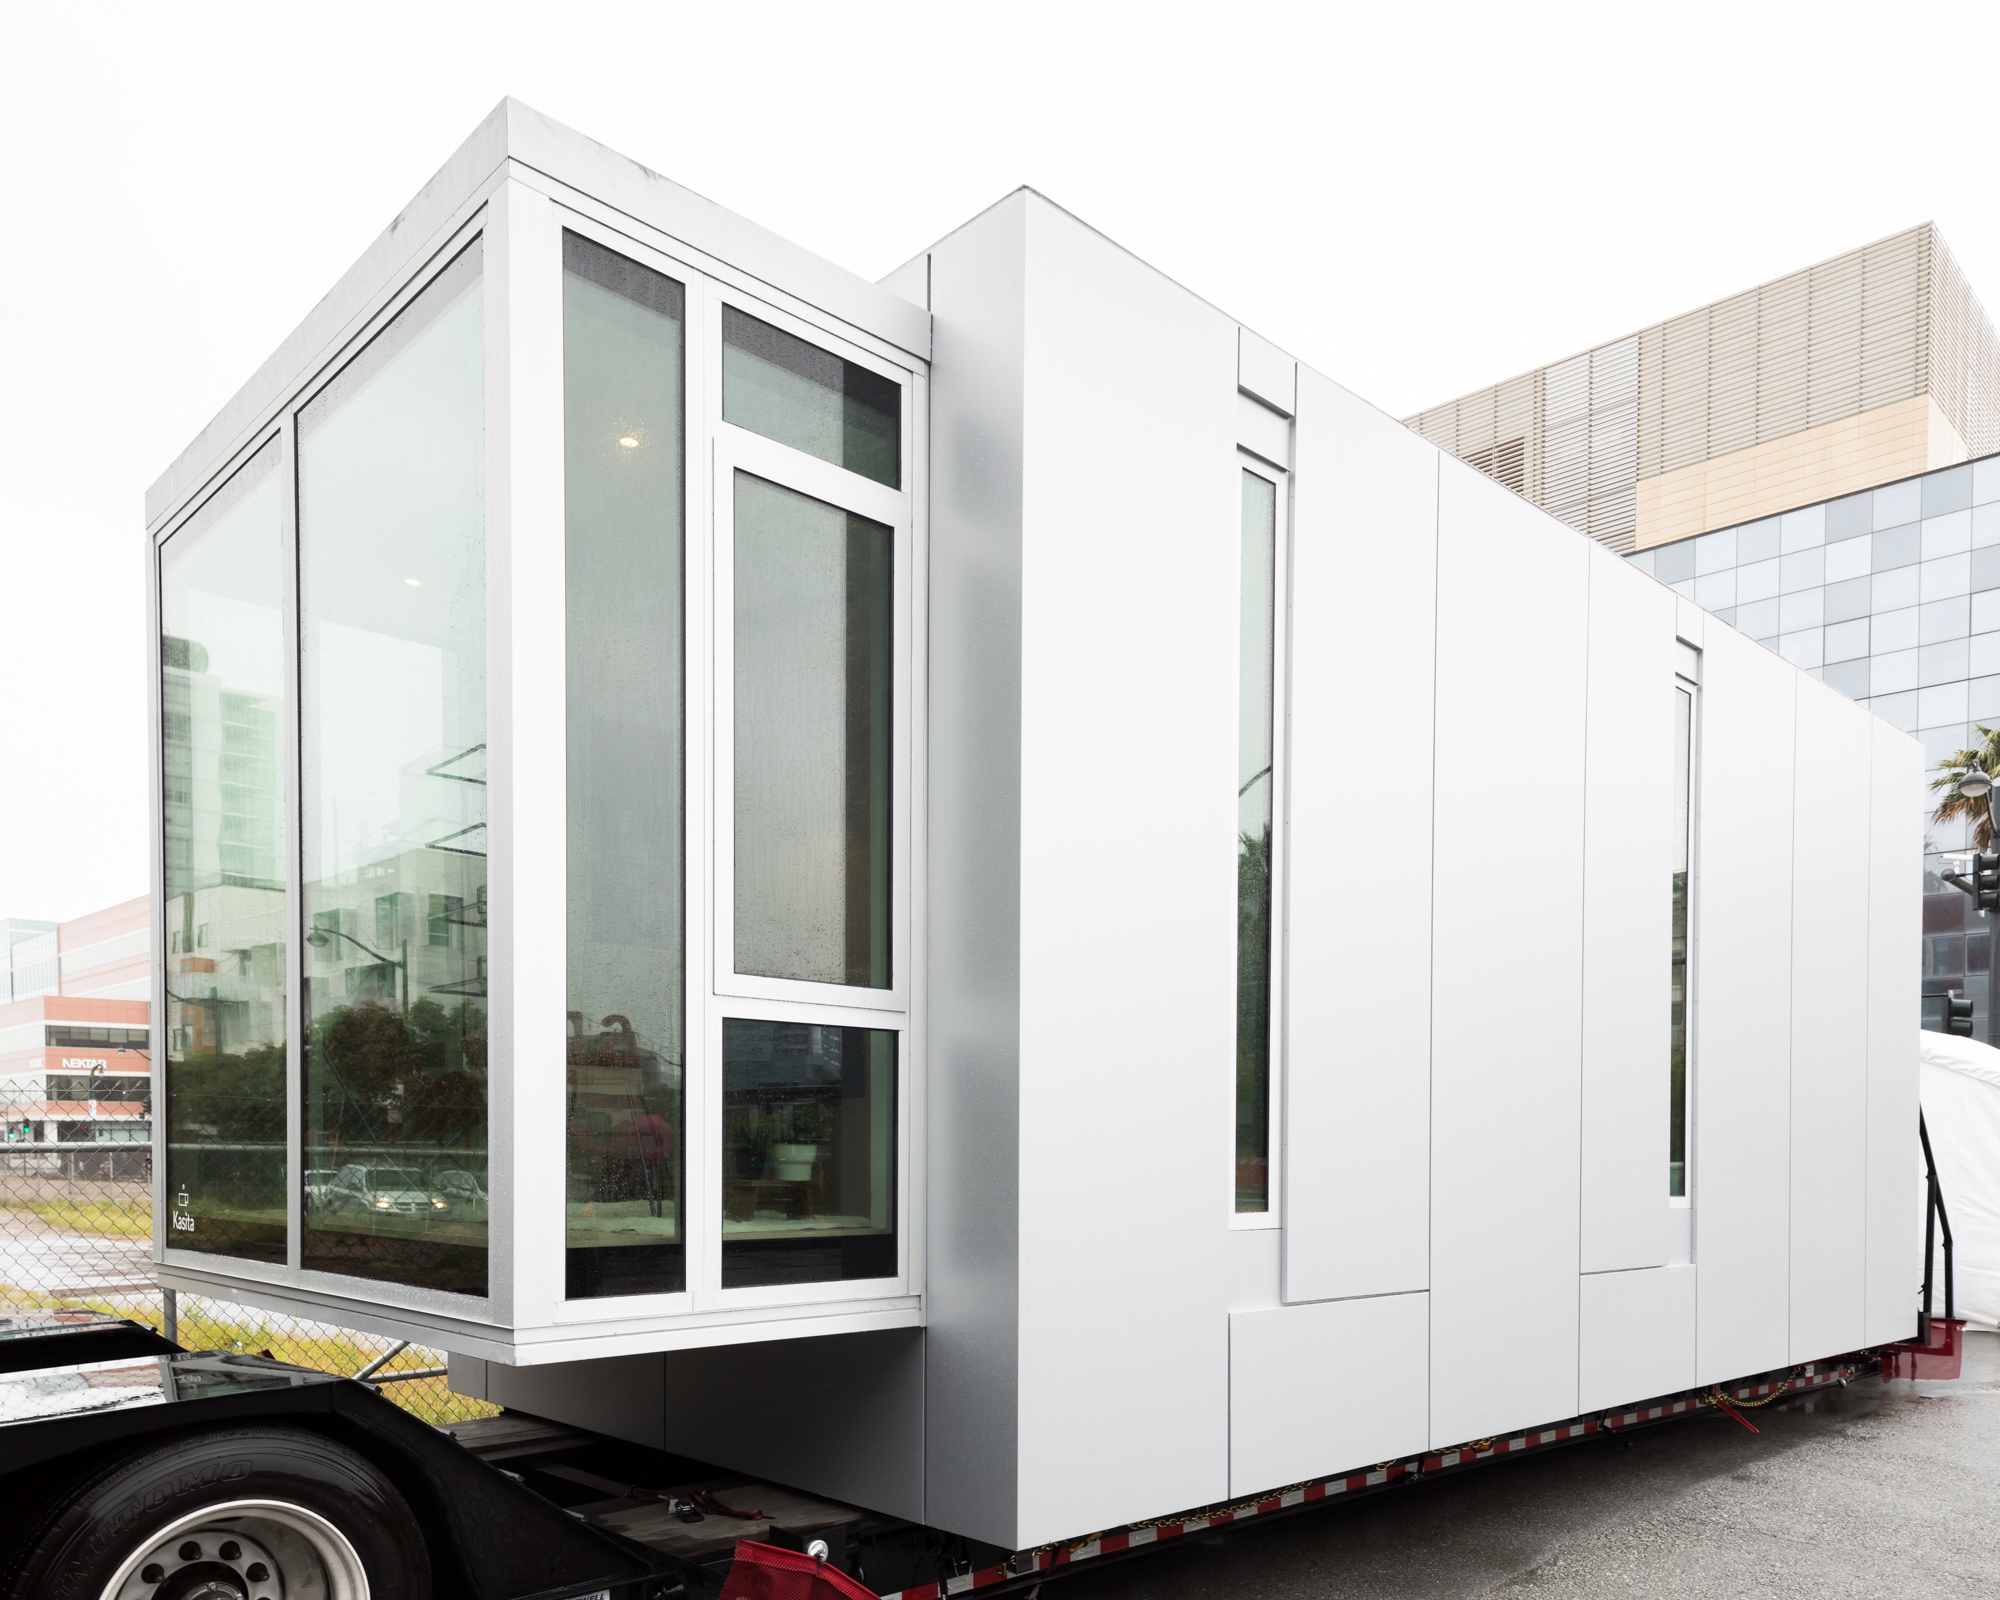 Inside The Modular Home Inspired By Dumpster Living